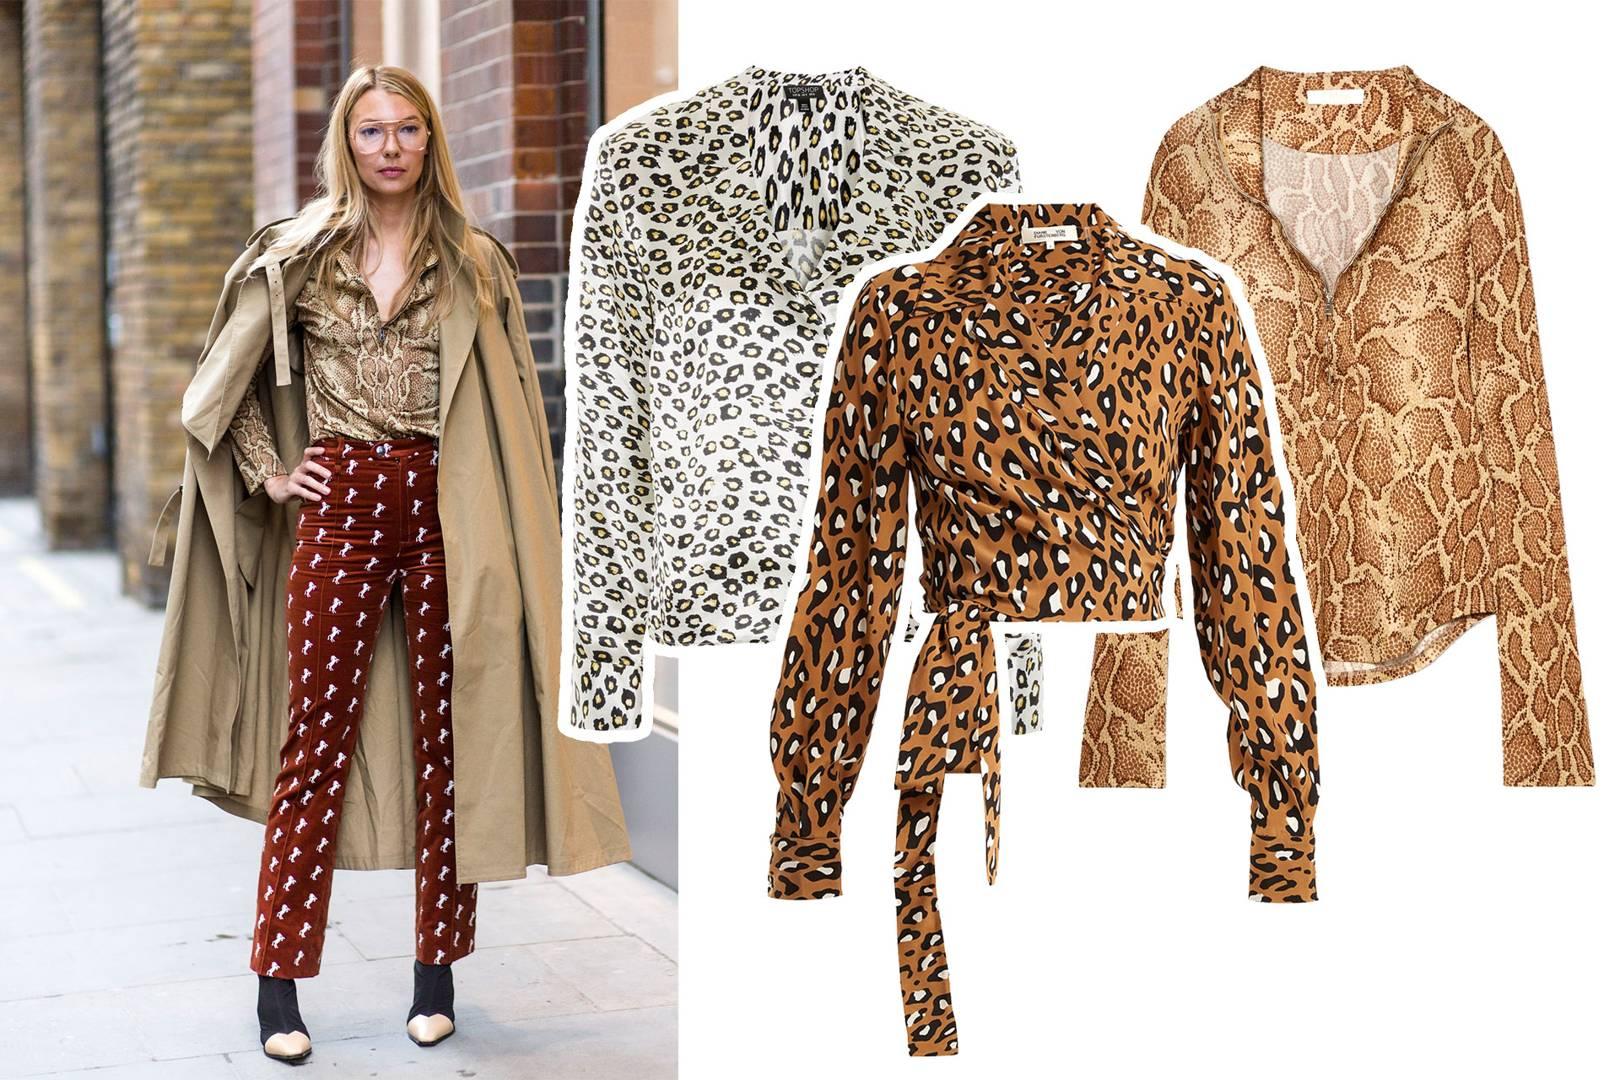 ea3ea98fc3e5 Shop The Street Style: Animal Print | British Vogue